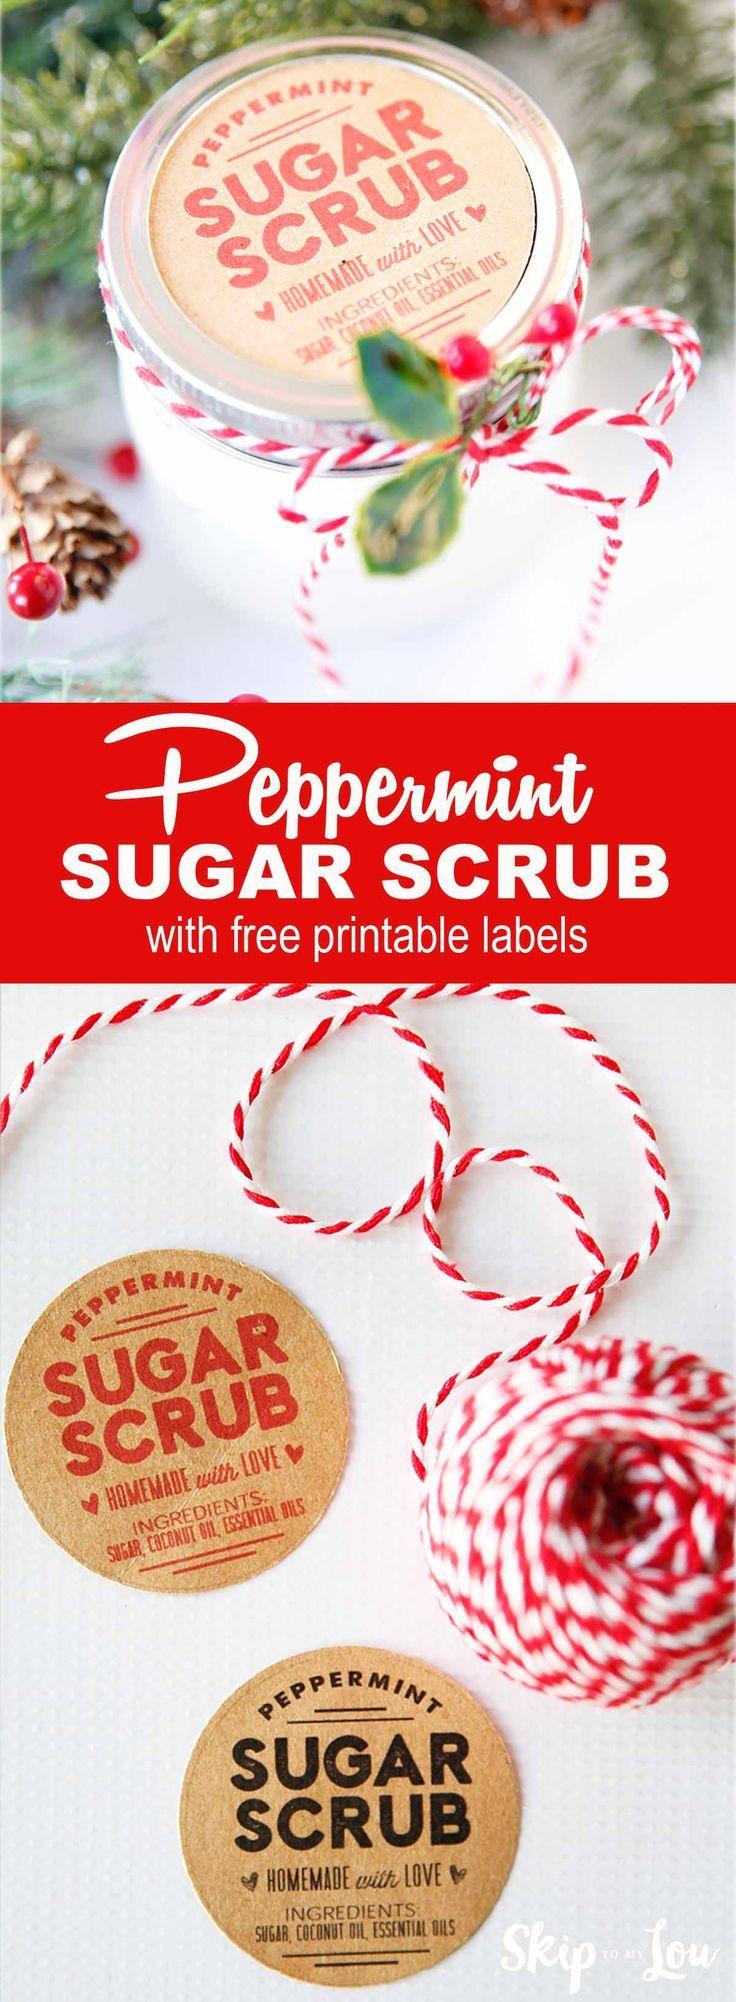 Peppermint sugar scrub recipe! Perfect for a handmade or homemade gift idea. #recipes #giftidea #spa